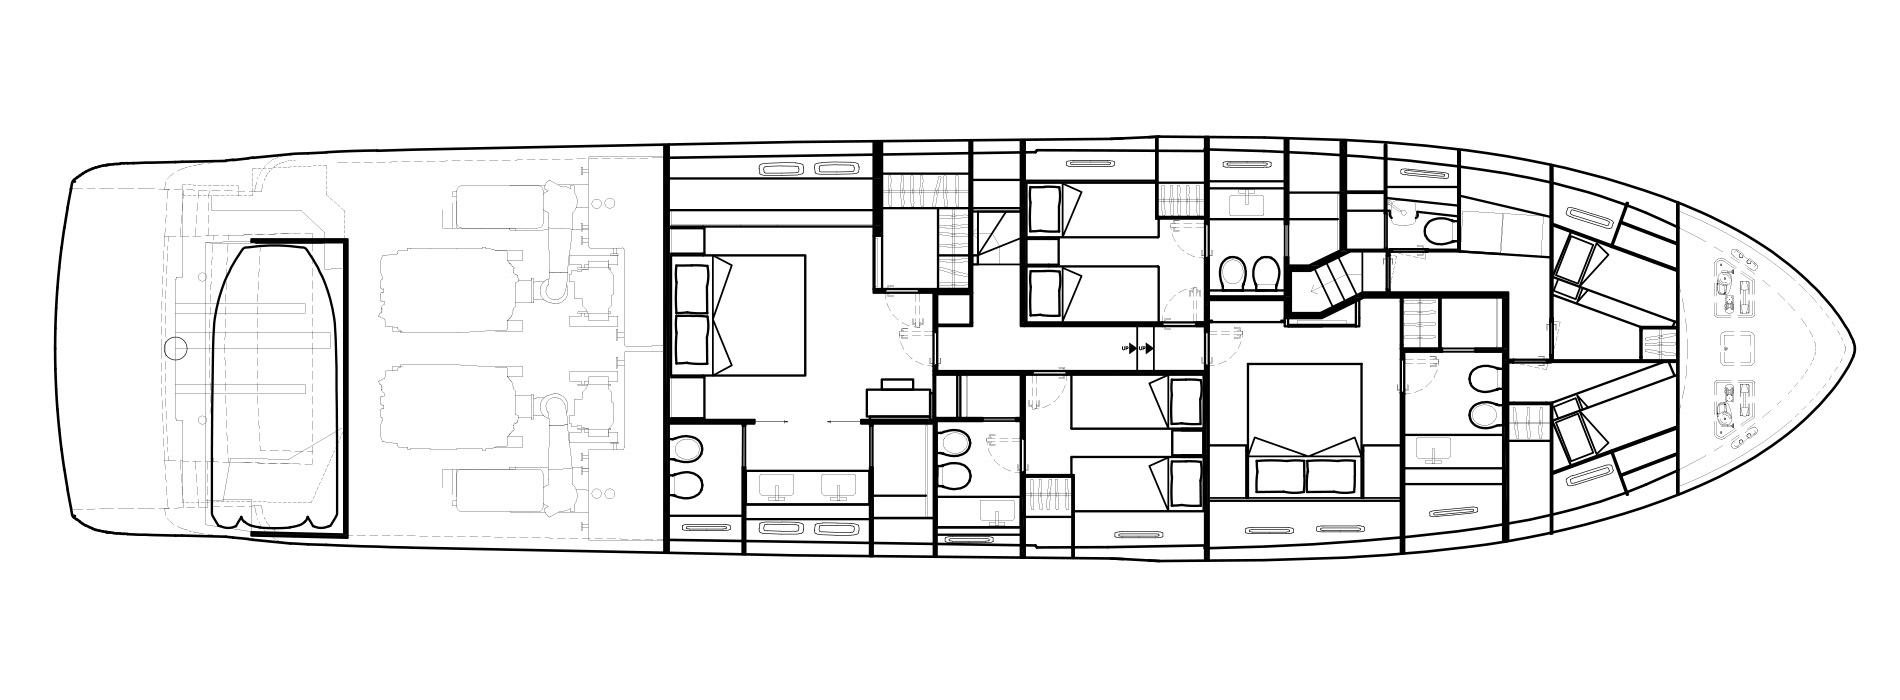 Sanlorenzo Yachts SL86 Lower Deck Version A